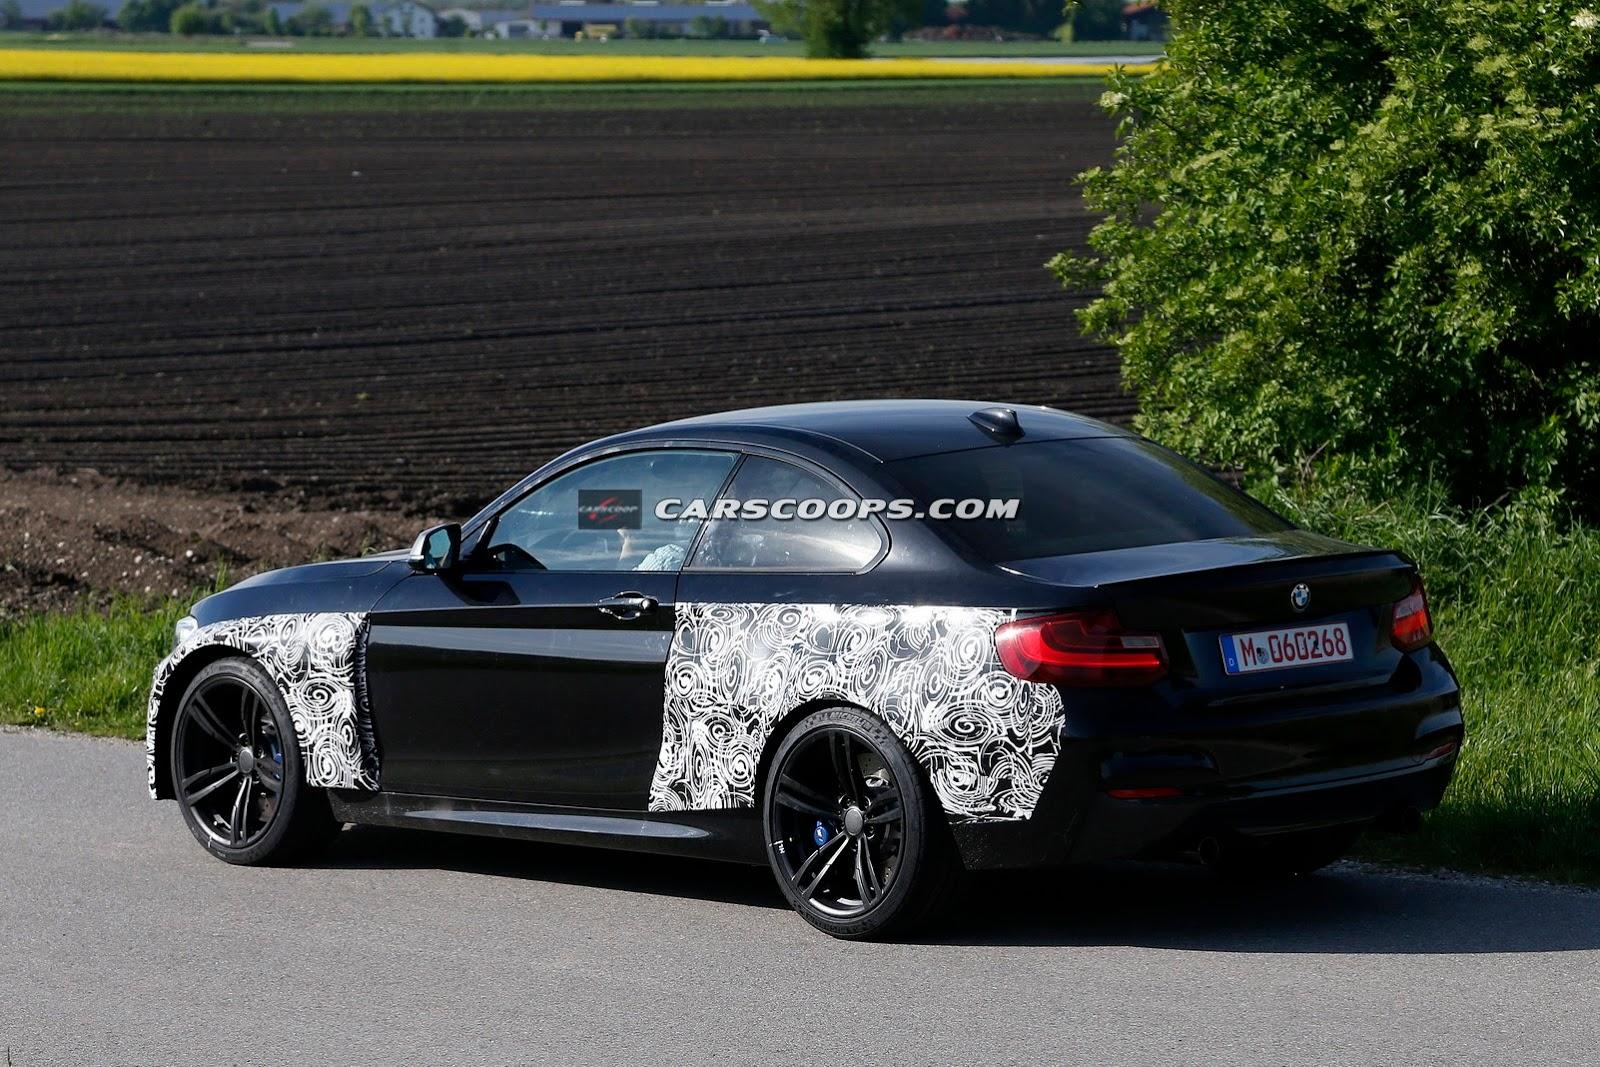 2016 - [BMW] M2 [F87] - Page 3 BMW-M2-Carscoops-9%25255B3%25255D